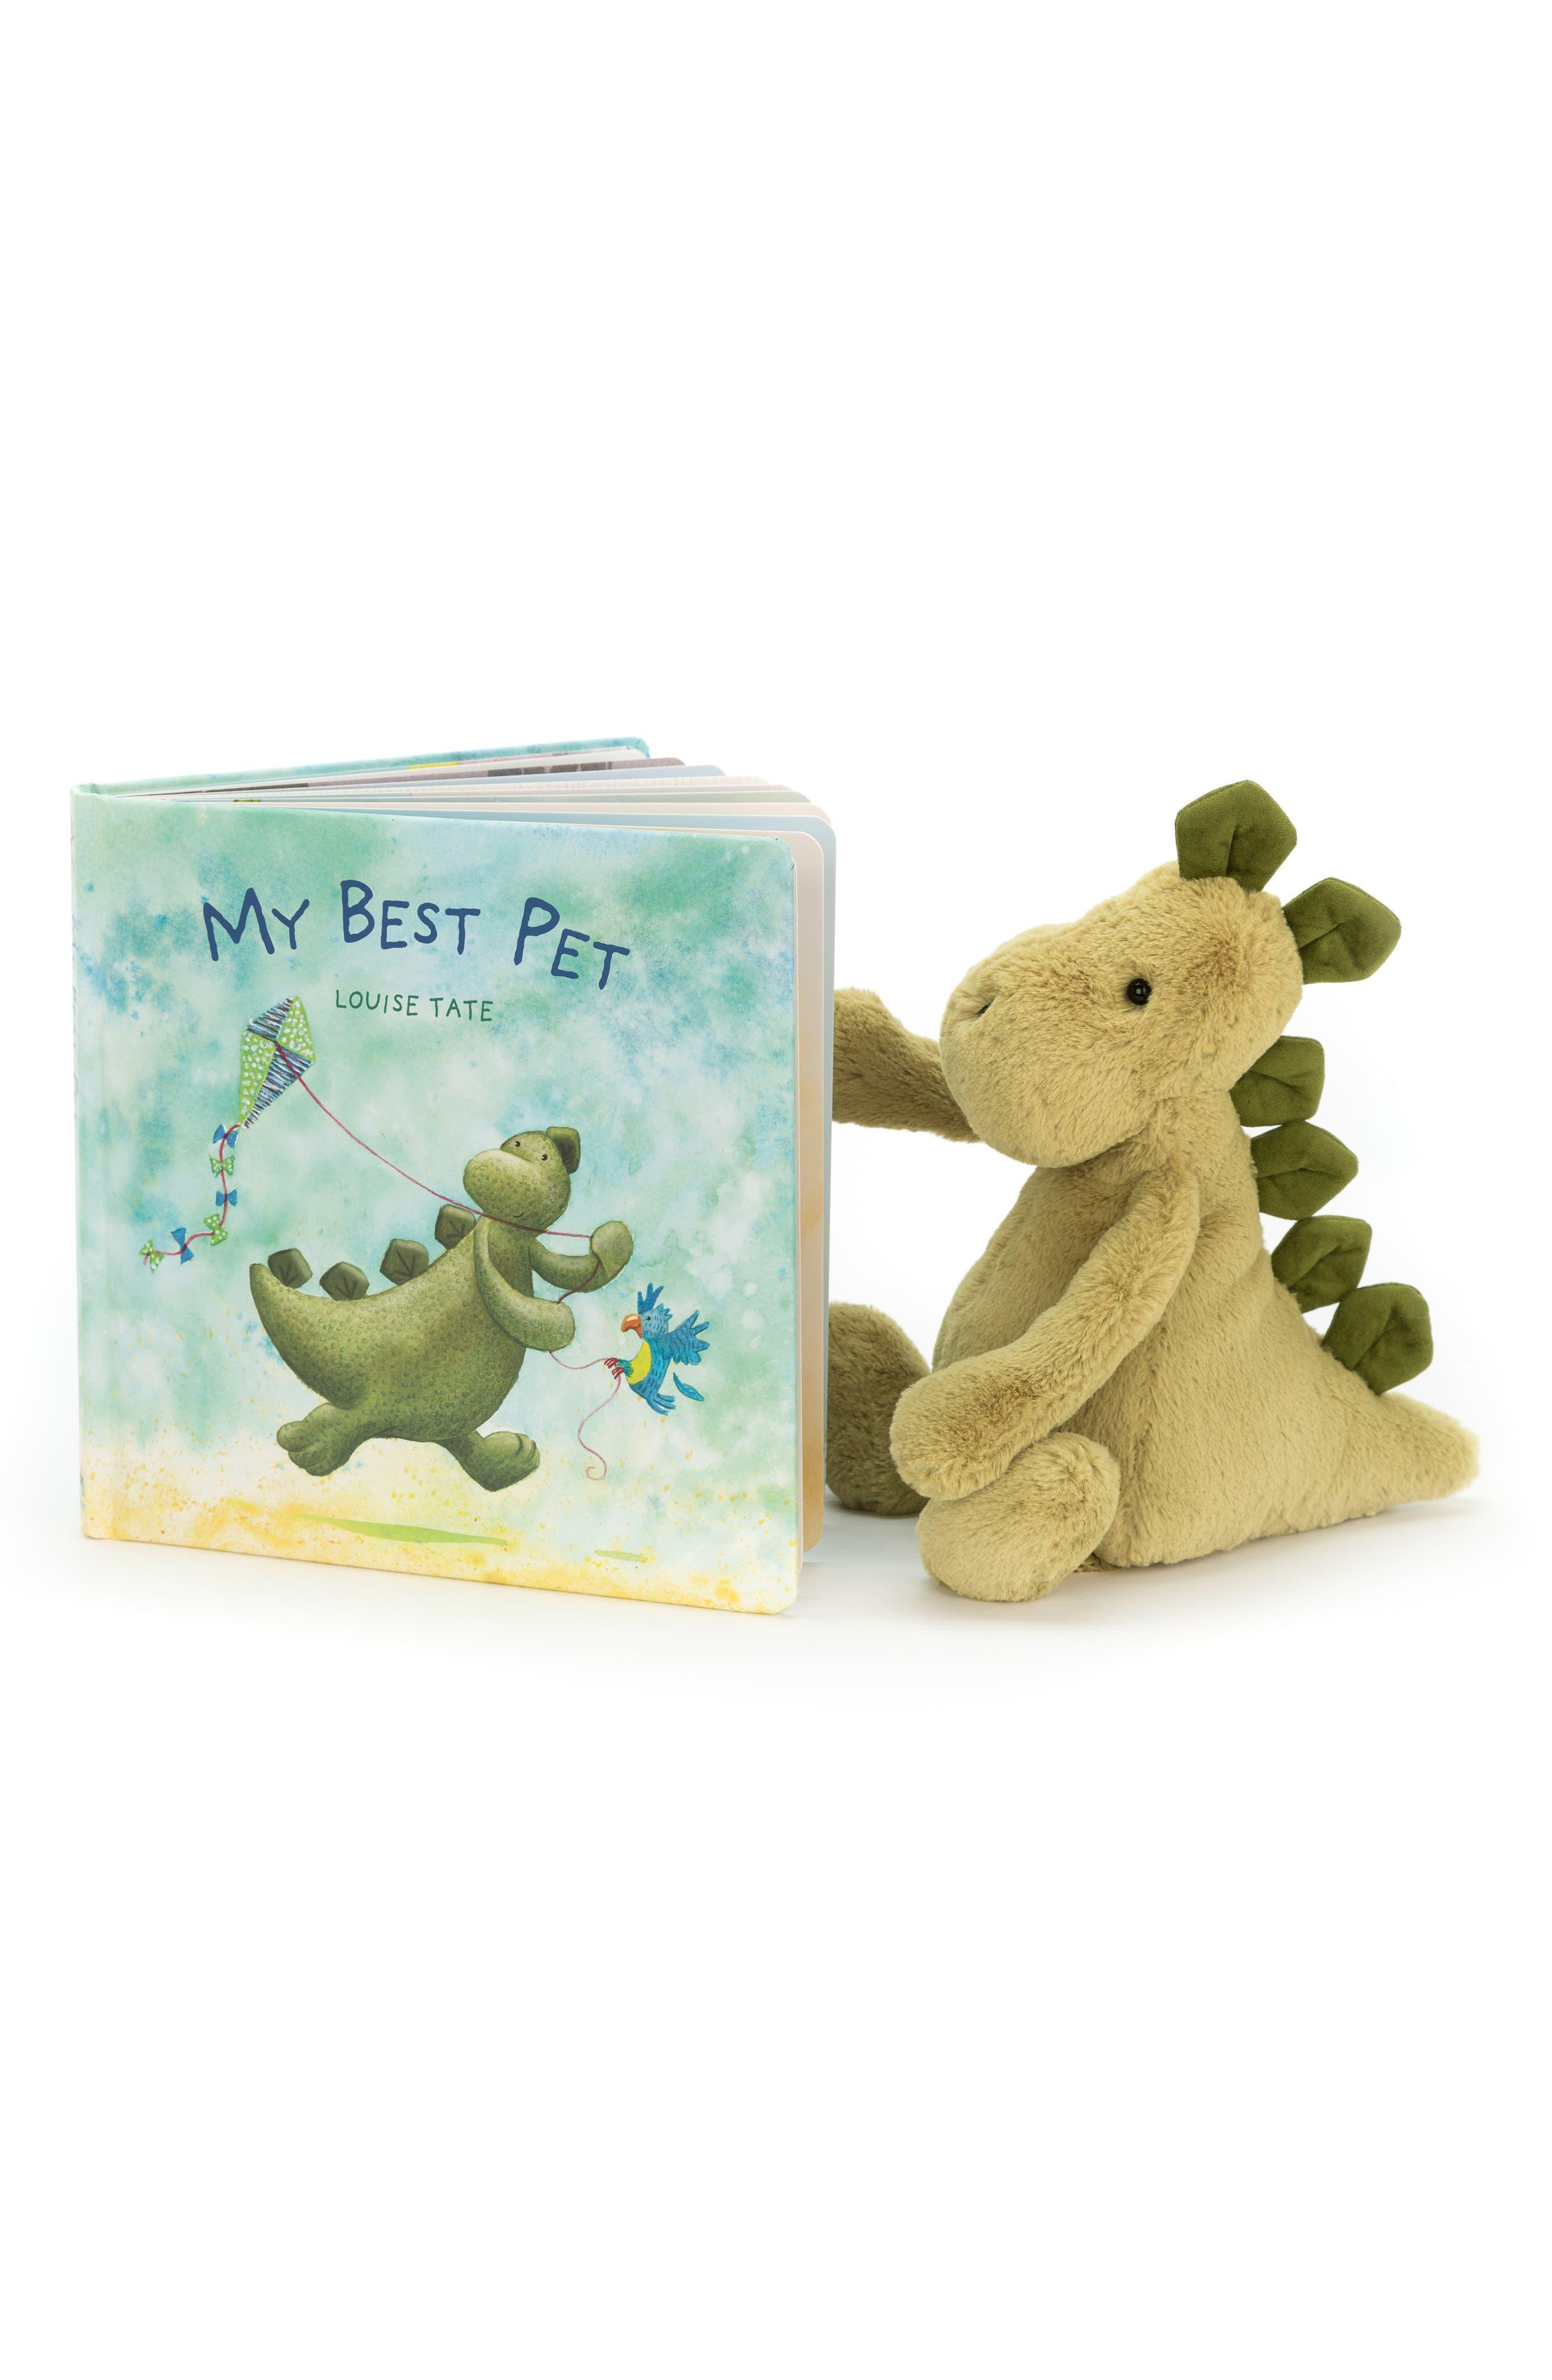 JELLYCAT 'My Best Pet' Board Book & Stuffed Animal, Main, color, GREEN